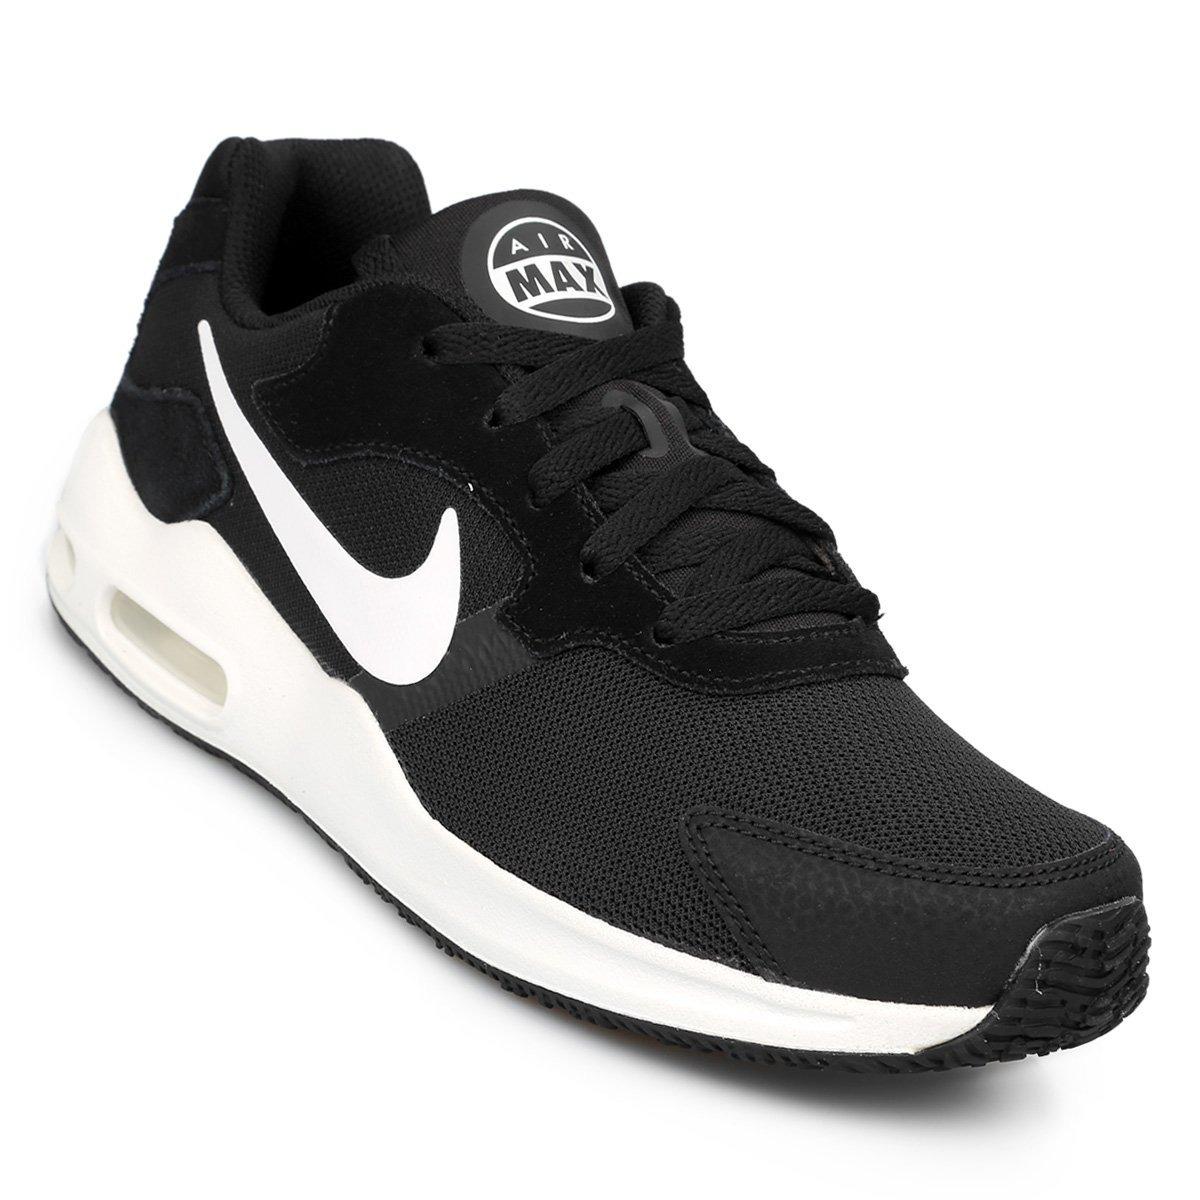 68449b3502be4 Zapatillas Nike Air Max Guile (originales) -   4.343